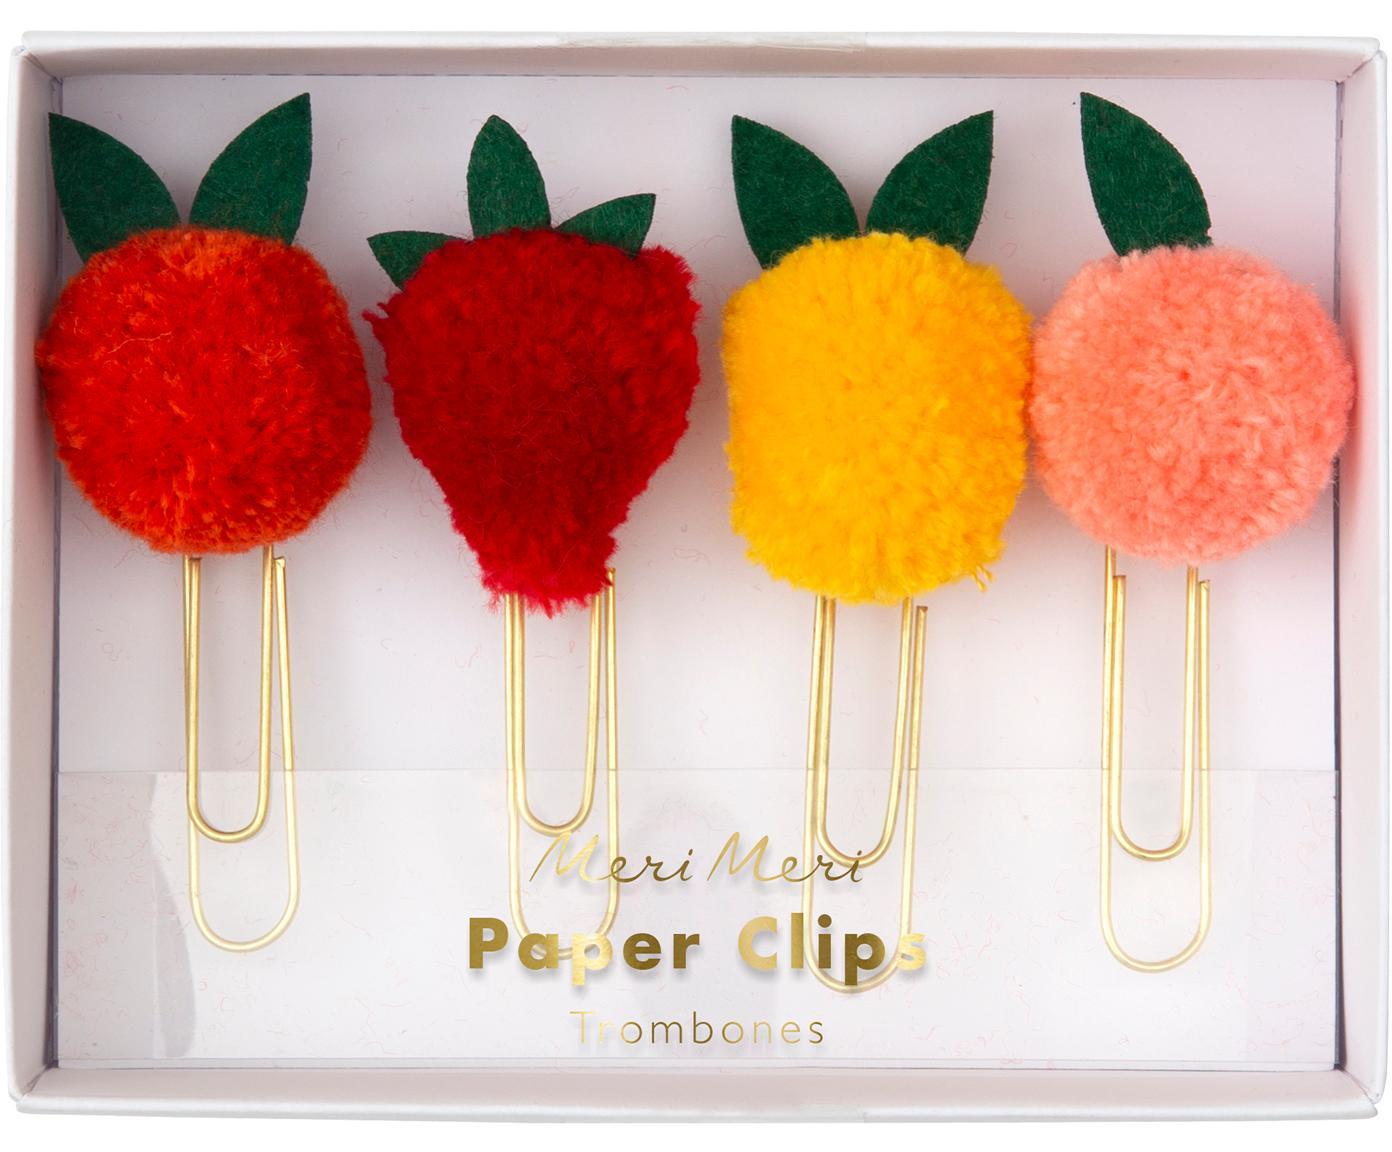 Büroklammer-Set Fruit, 4-tlg., Metall, lackiert, Polyester, Rottöne, Rosa, Gelb, Goldfarben, 2 x 5 cm